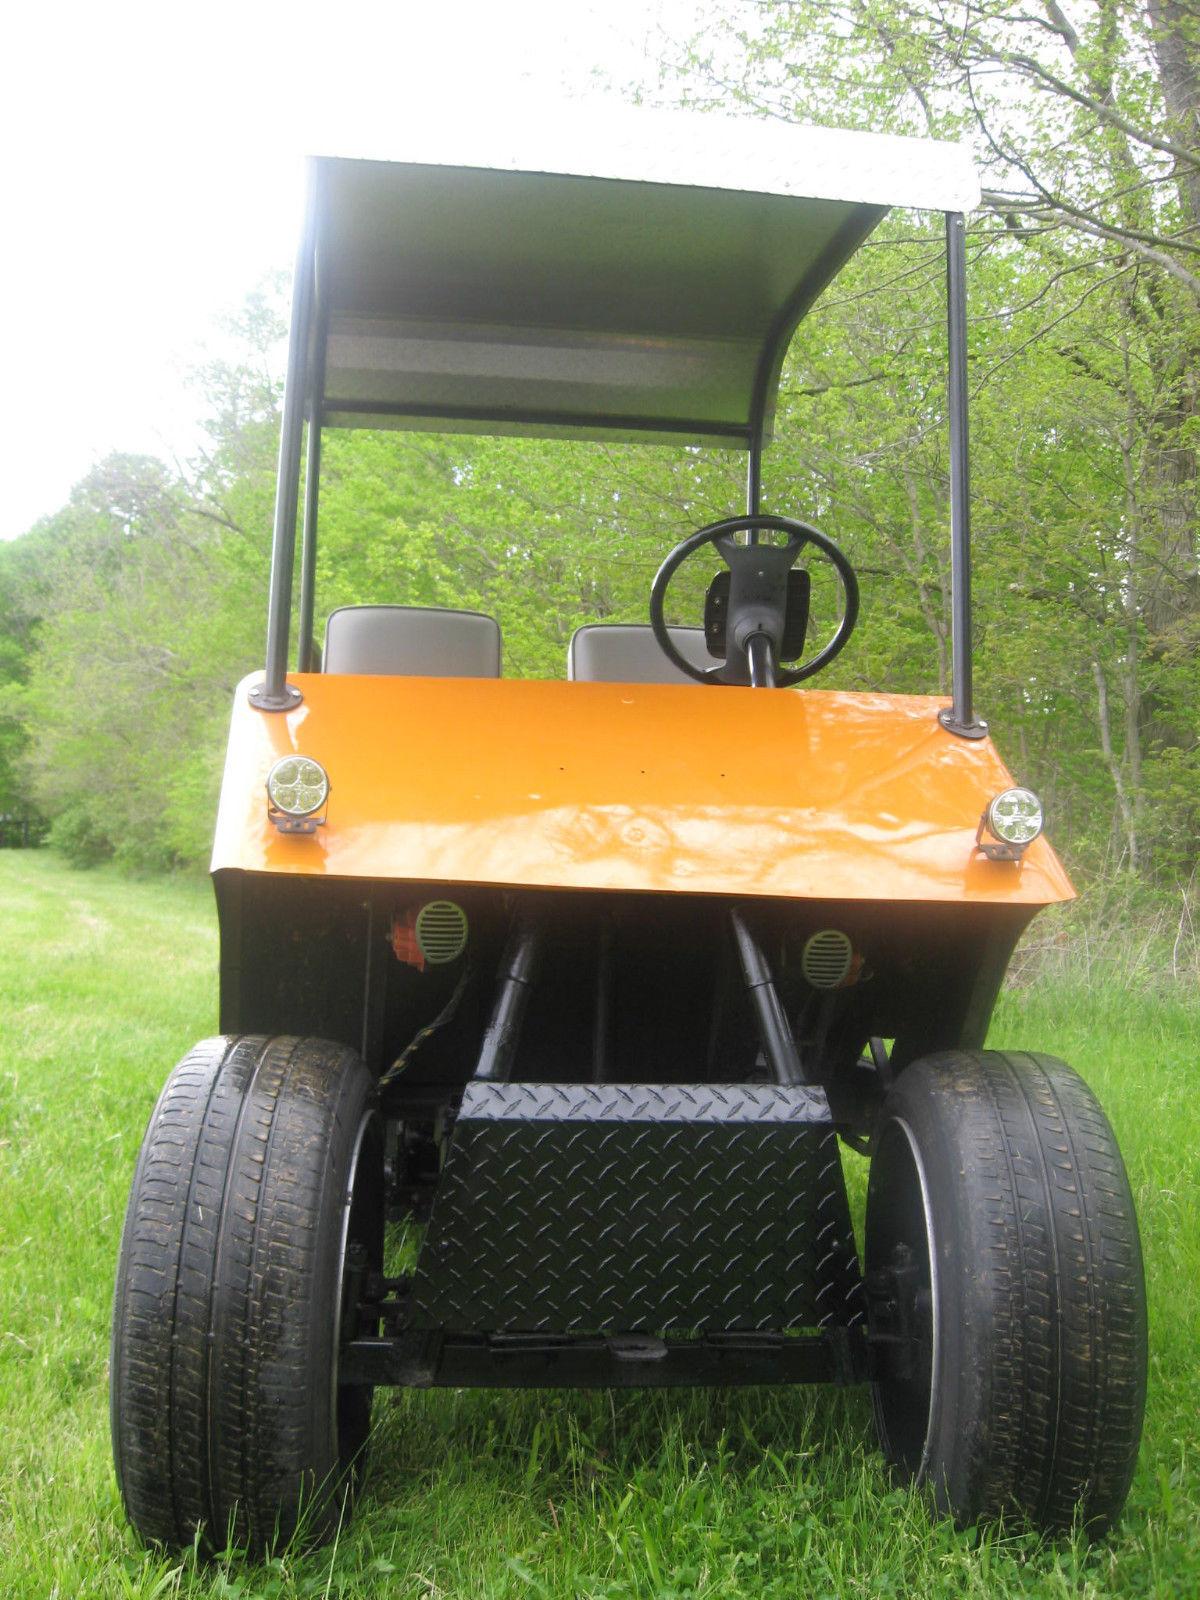 Golf Cart with a Suzuki GSX-R600 – Engine Swap Depot Homemade Shifter For Golf Cart on homemade tv, homemade hot tub, homemade atv, troubleshooting club car electric cart,